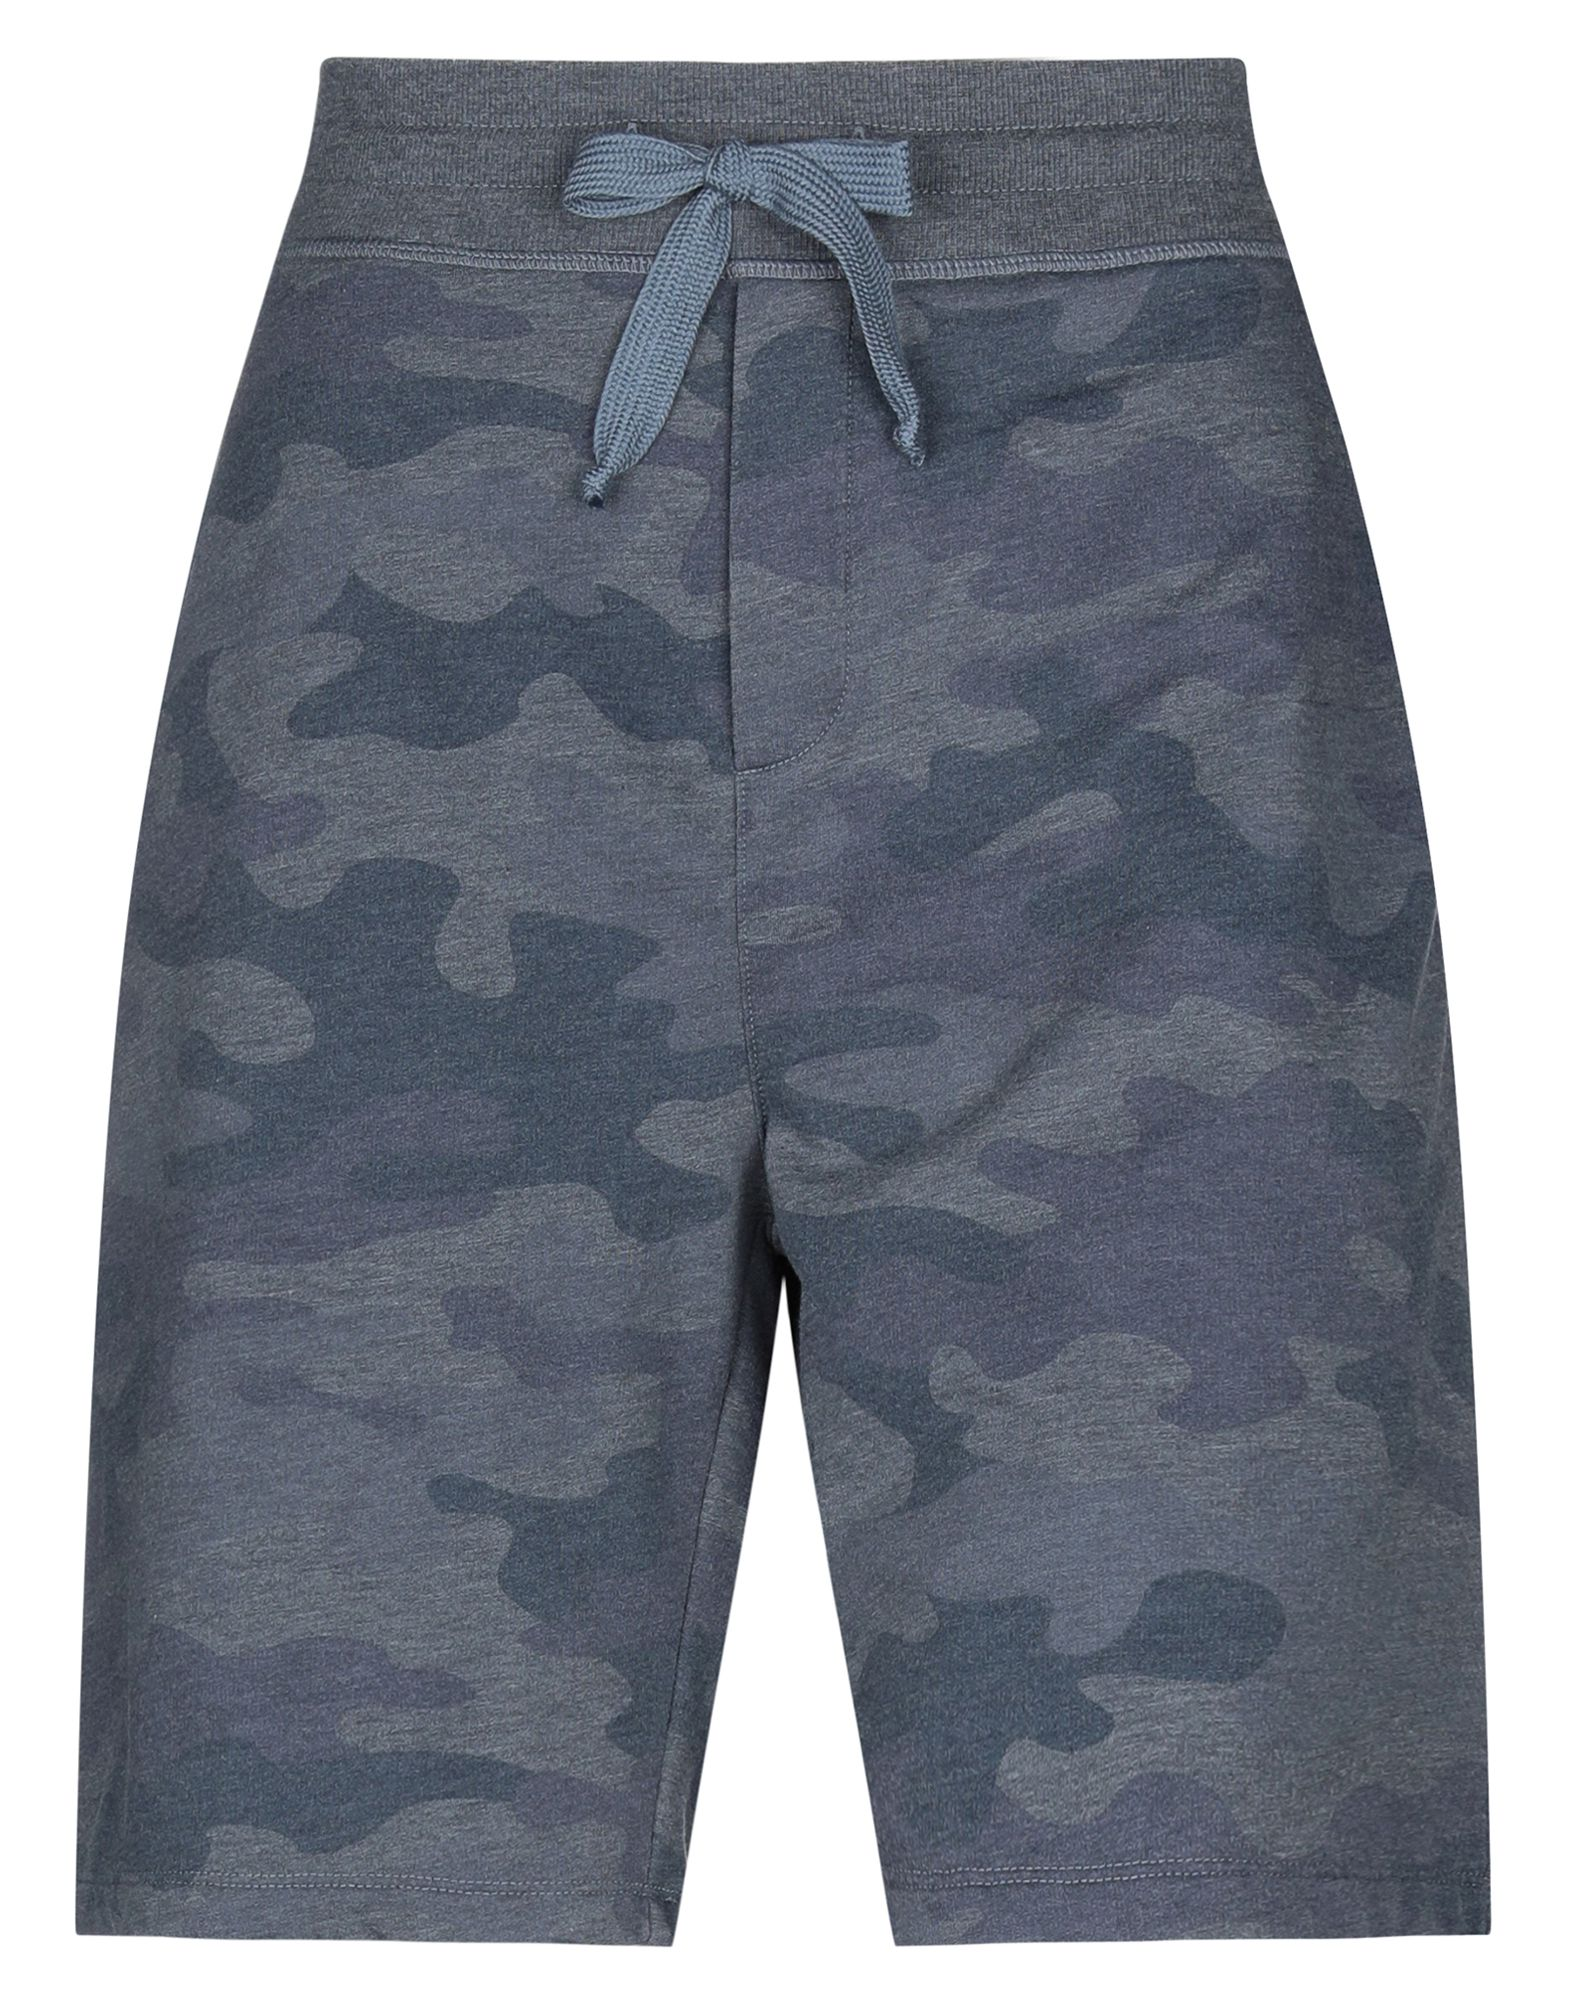 JUVIA Bermudas. sweatshirt fleece, camouflage, no appliqués, mid rise, tapered leg, drawstring closure, multipockets, fleece lining. 50% Cotton, 50% Polyester